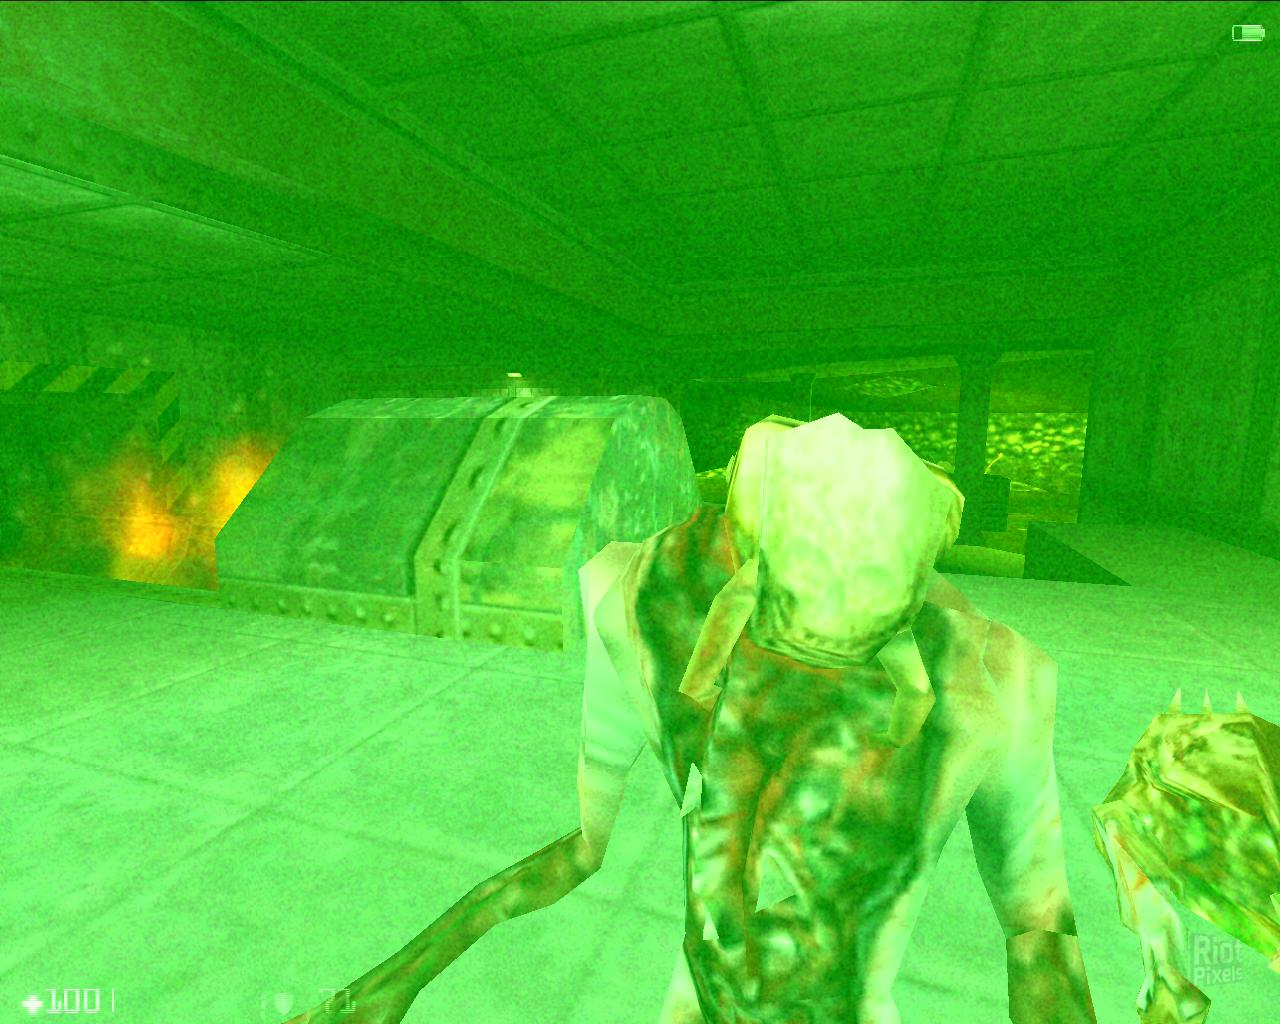 Half Life Opposing Force Game Screenshots At Riot Pixels Images